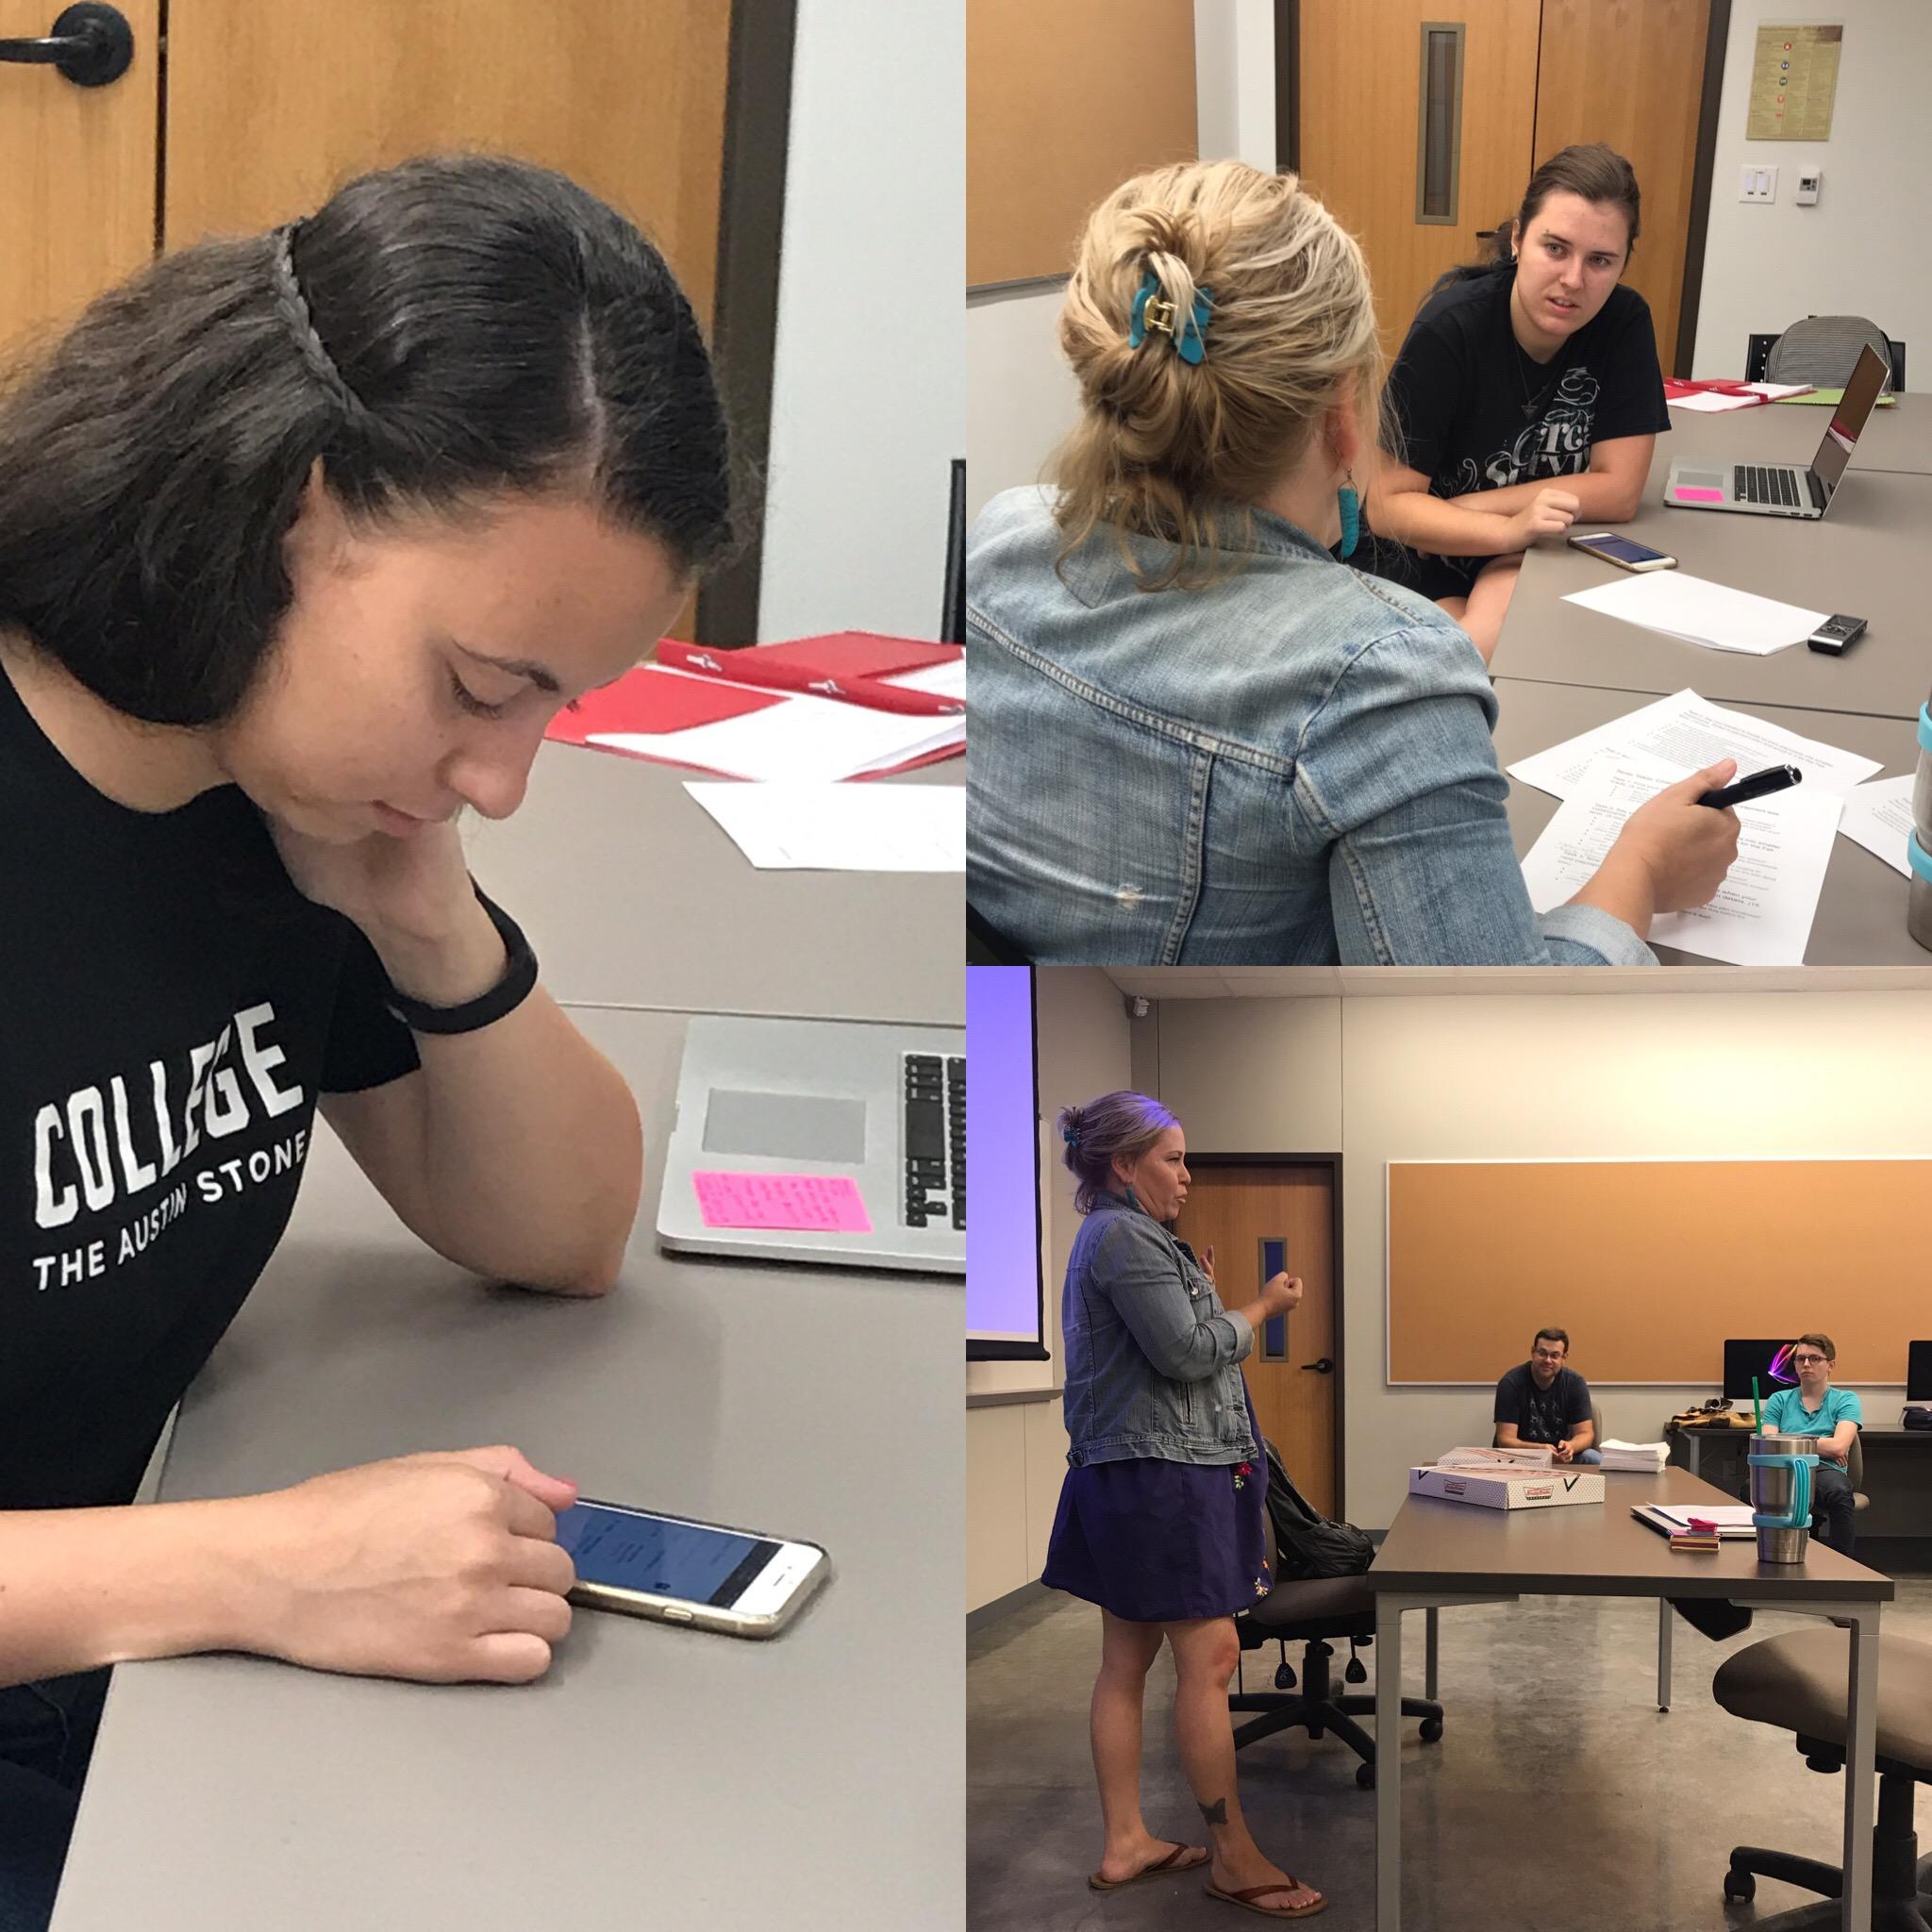 User testing at Texas State University